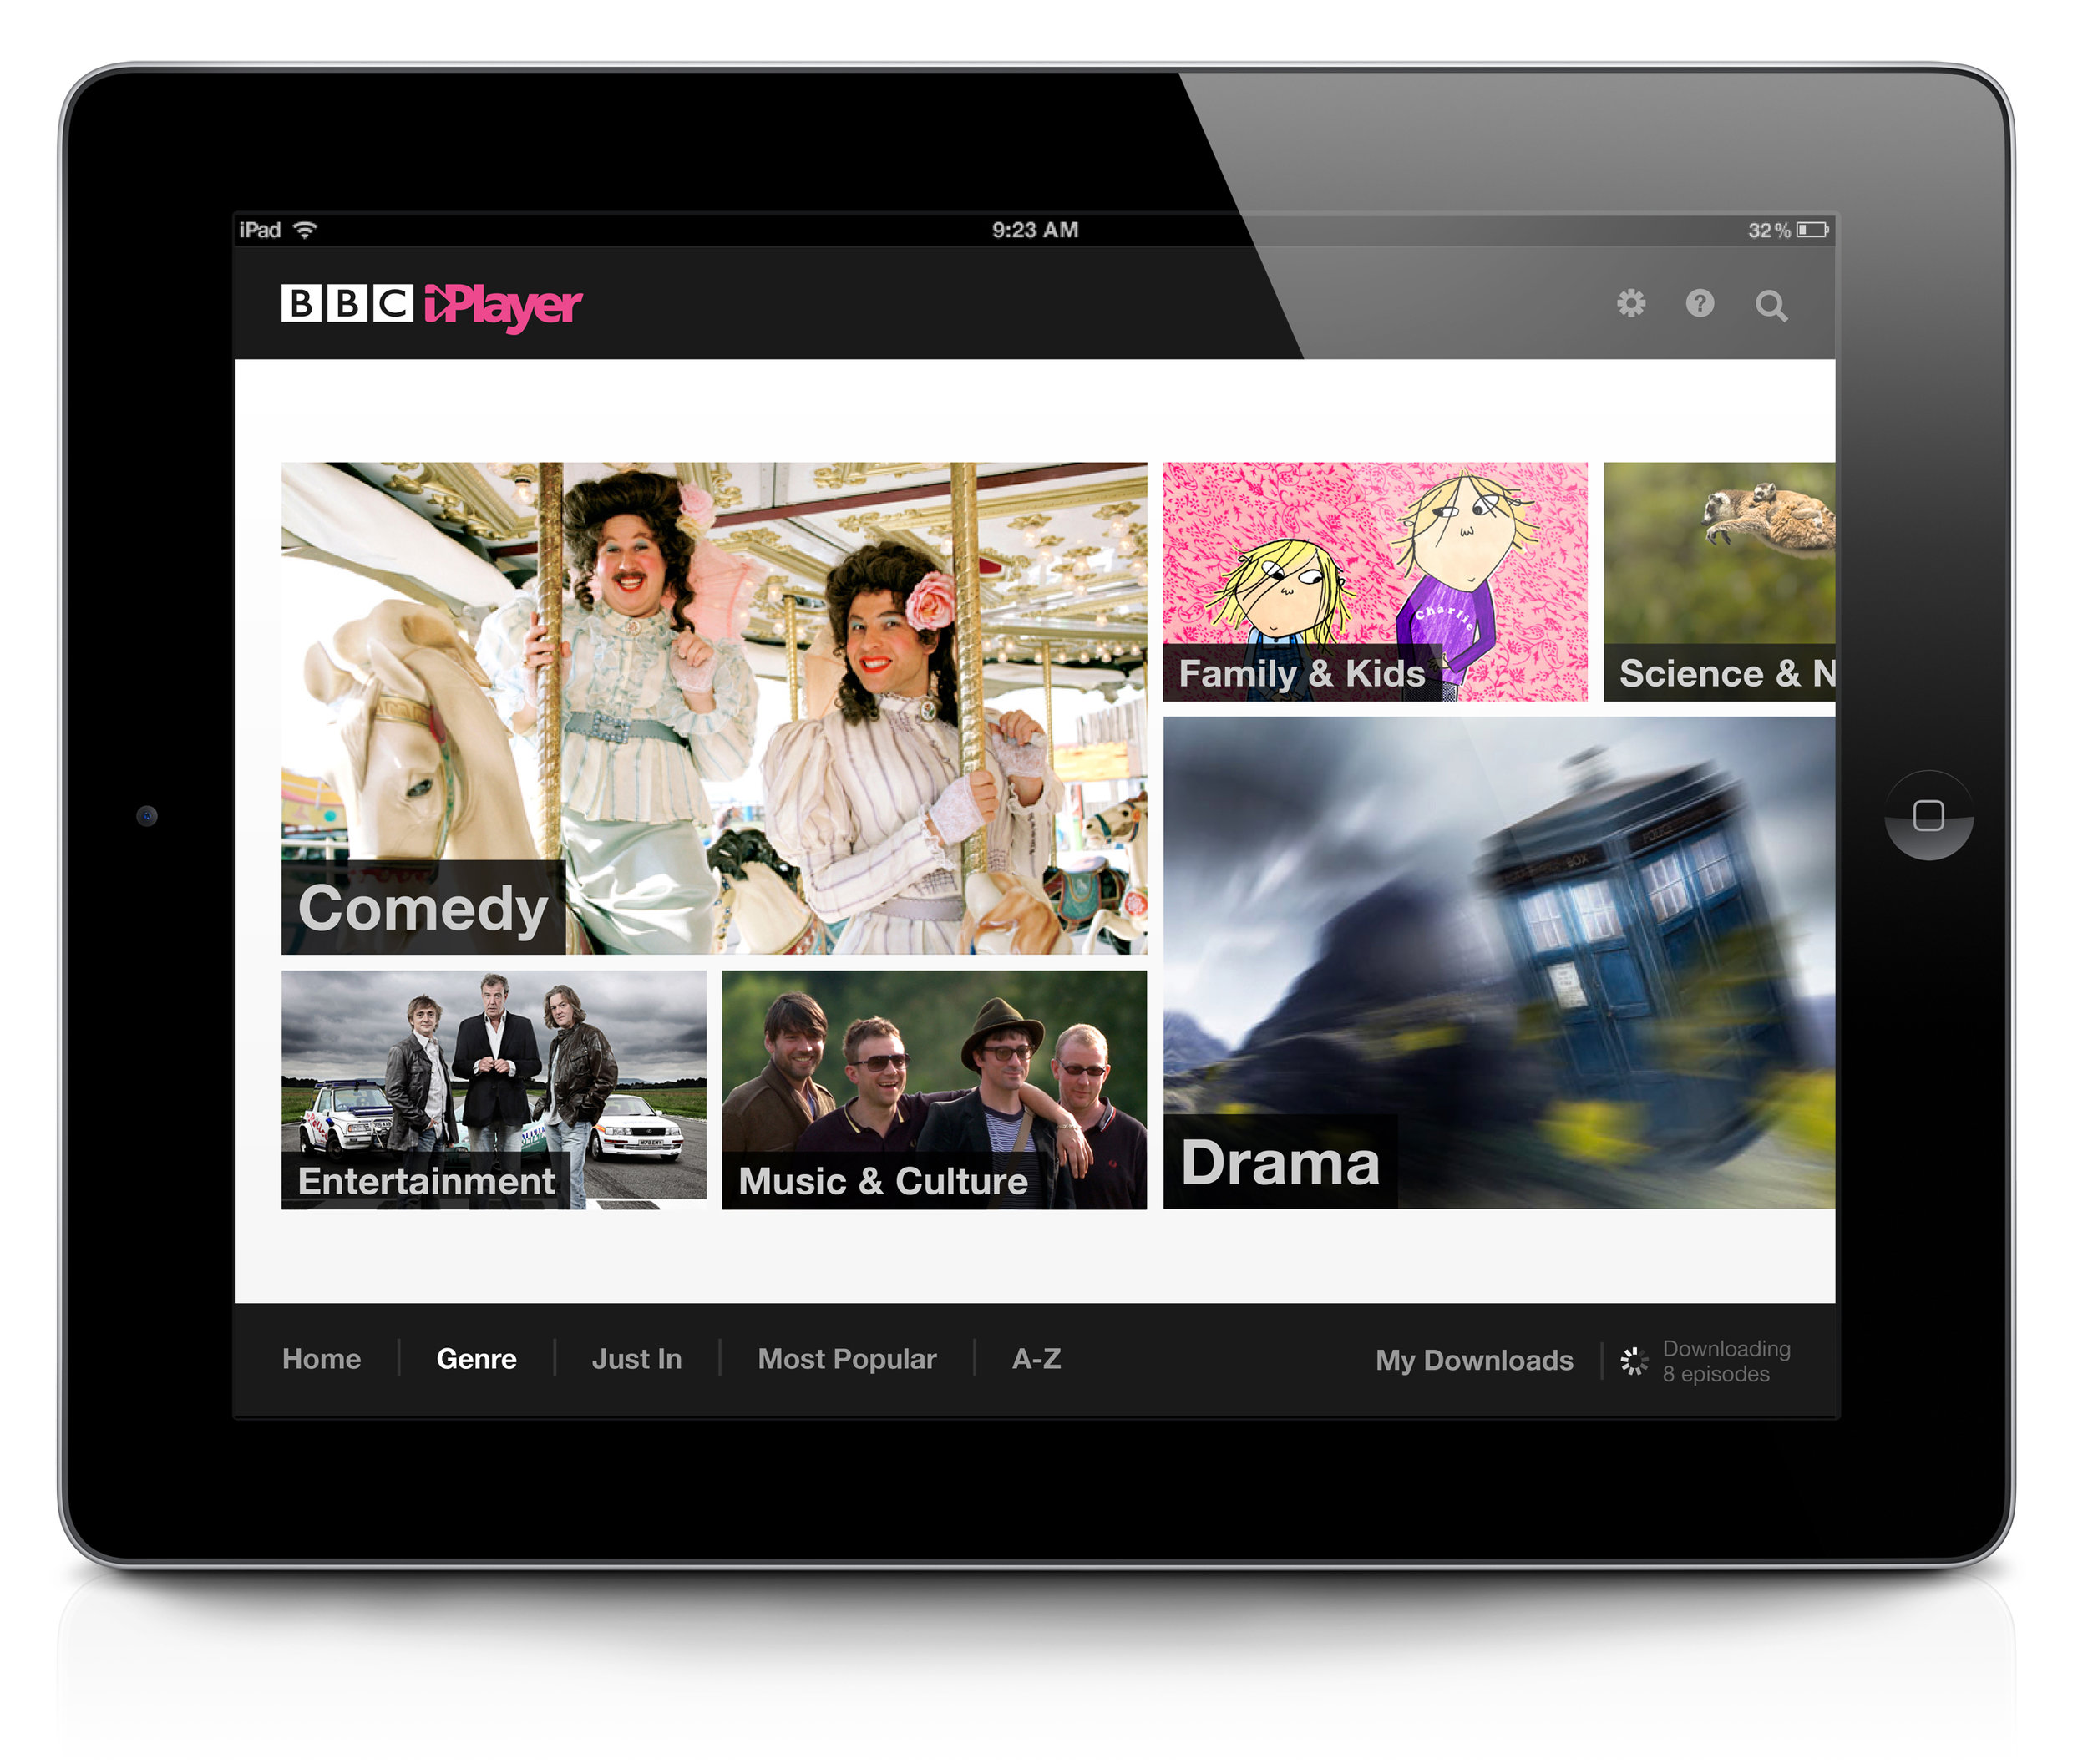 iPlayer_iPad2_Genre.jpg